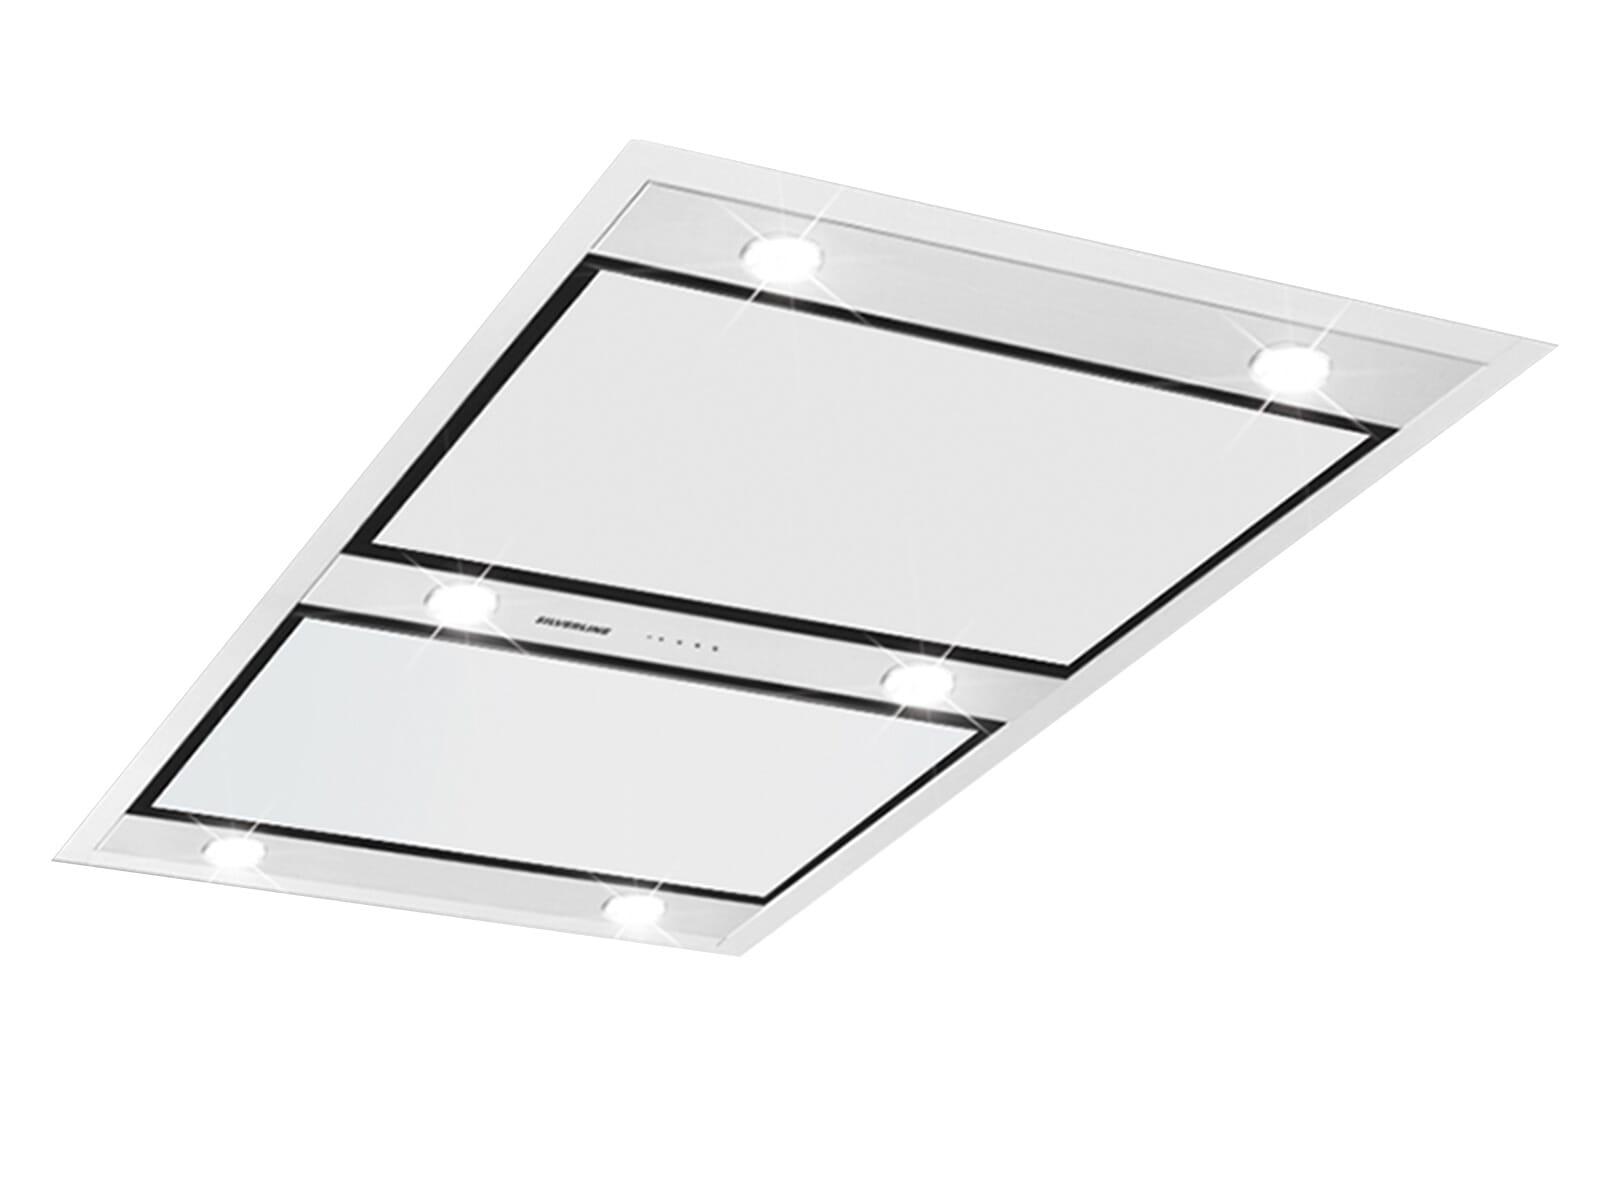 Silverline Vega Intern Premium VGID 123 E Deckenhaube Edelstahl